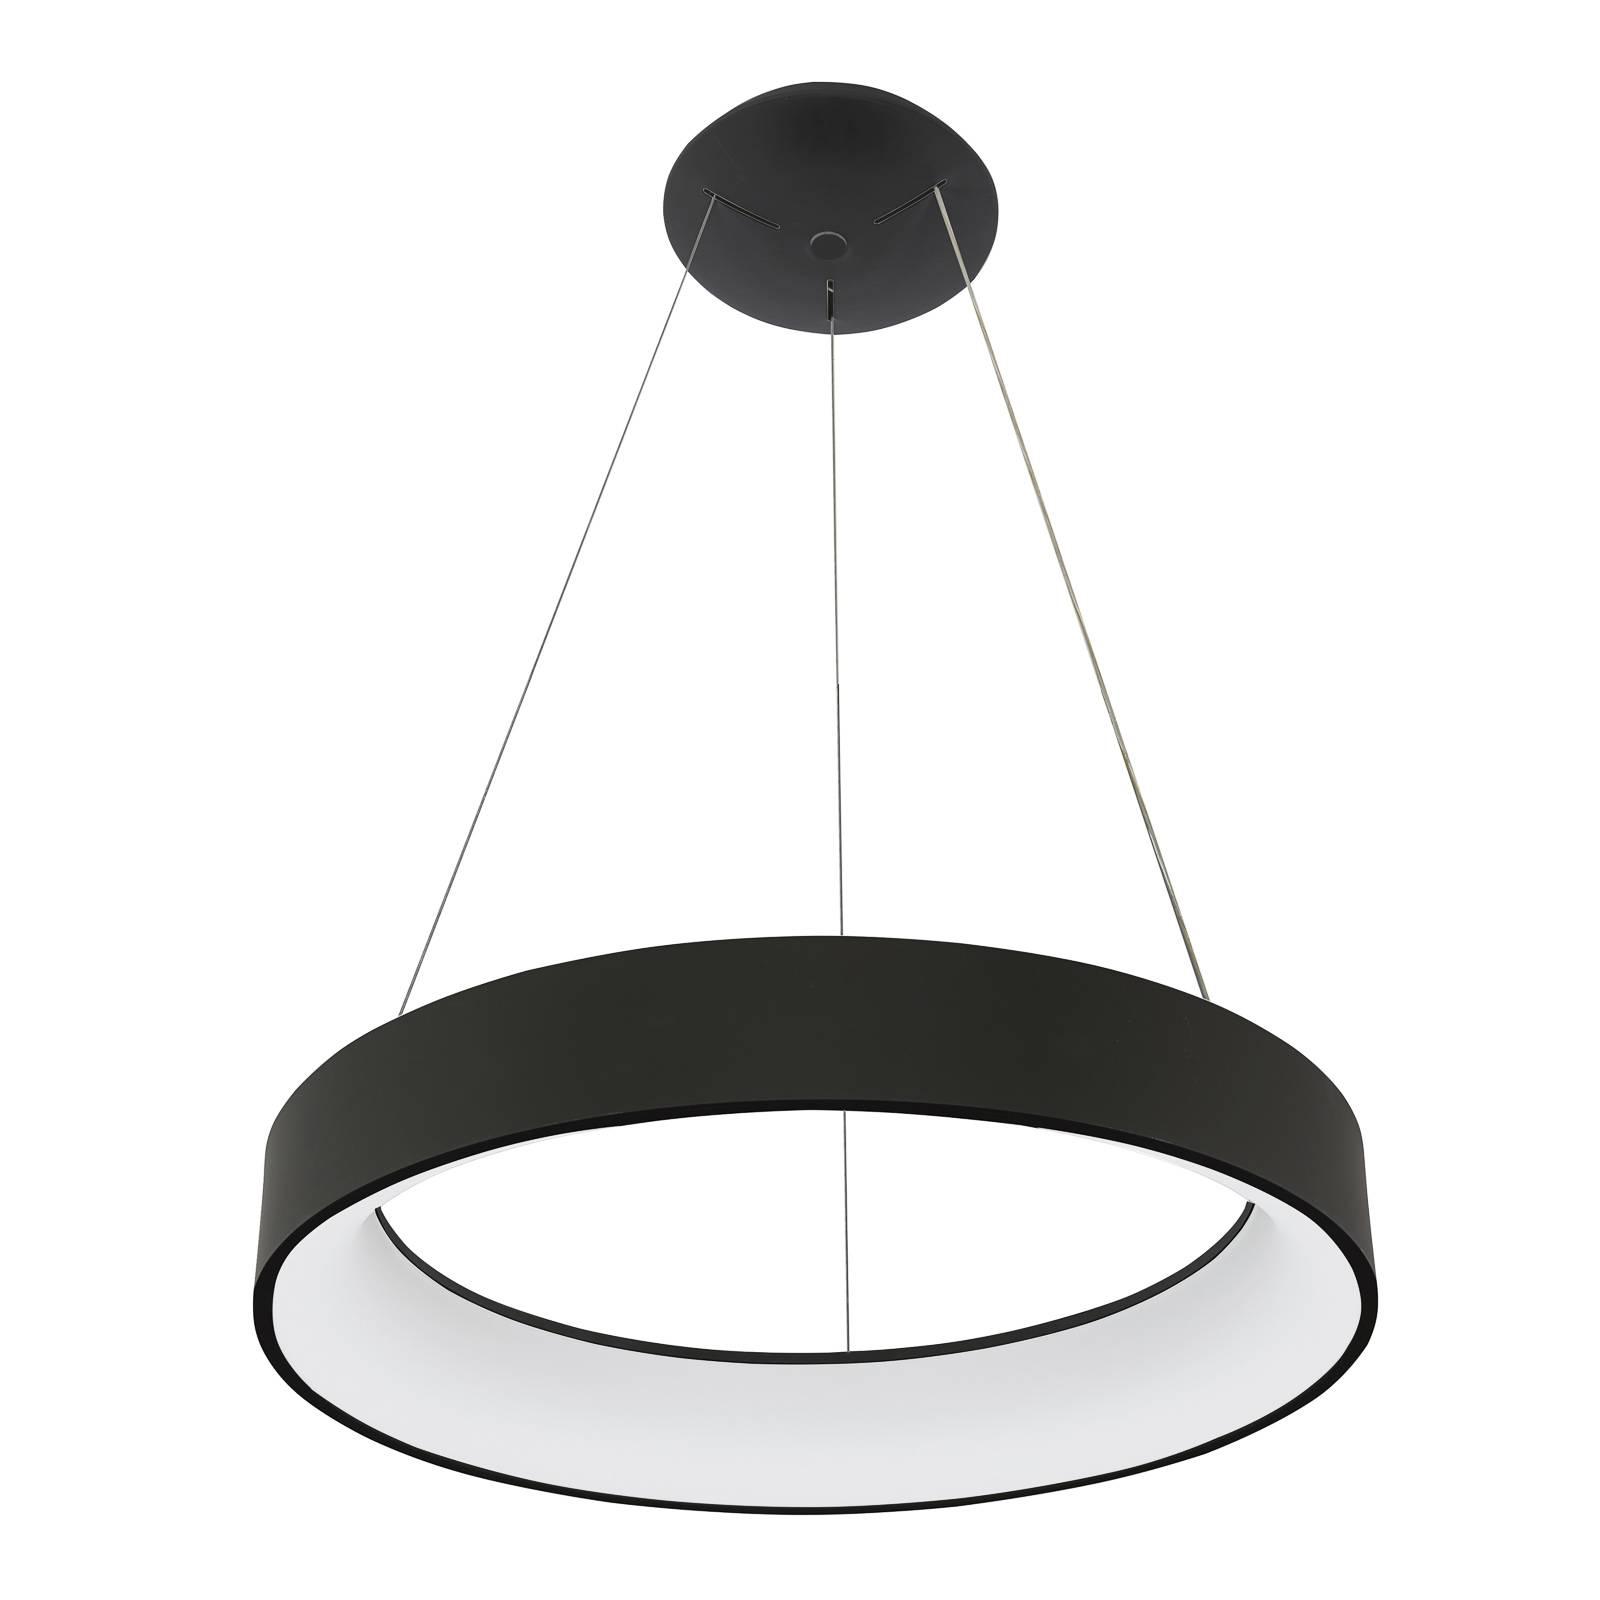 Arcchio Aleksi -LED-riippuvalaisin, Ø 45 cm pyöreä